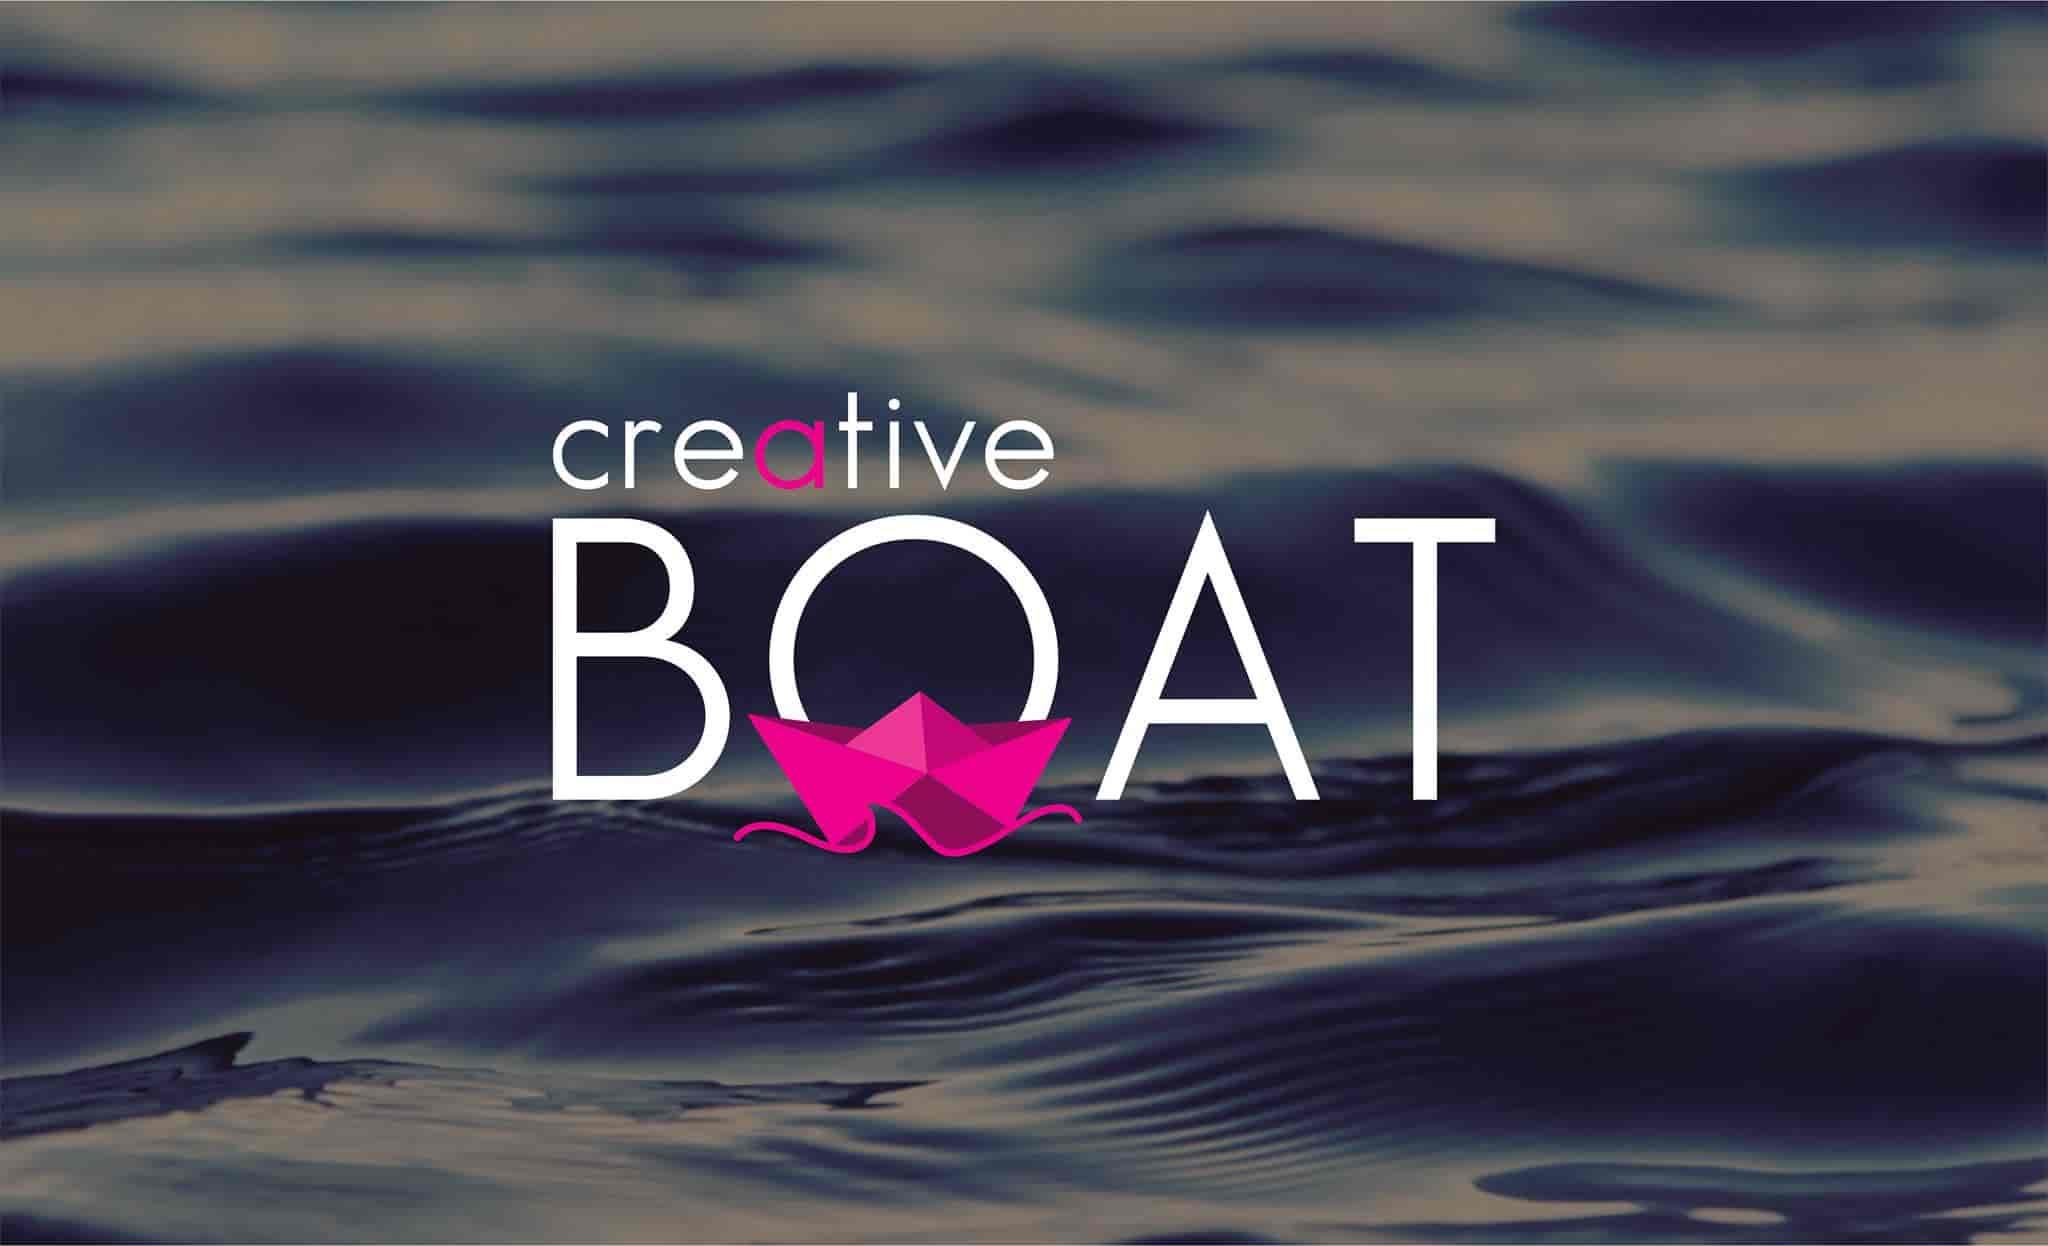 - Creative Boat Images, Karve Nagar-Hingne Budrukh, Pune - Advertising Agencies